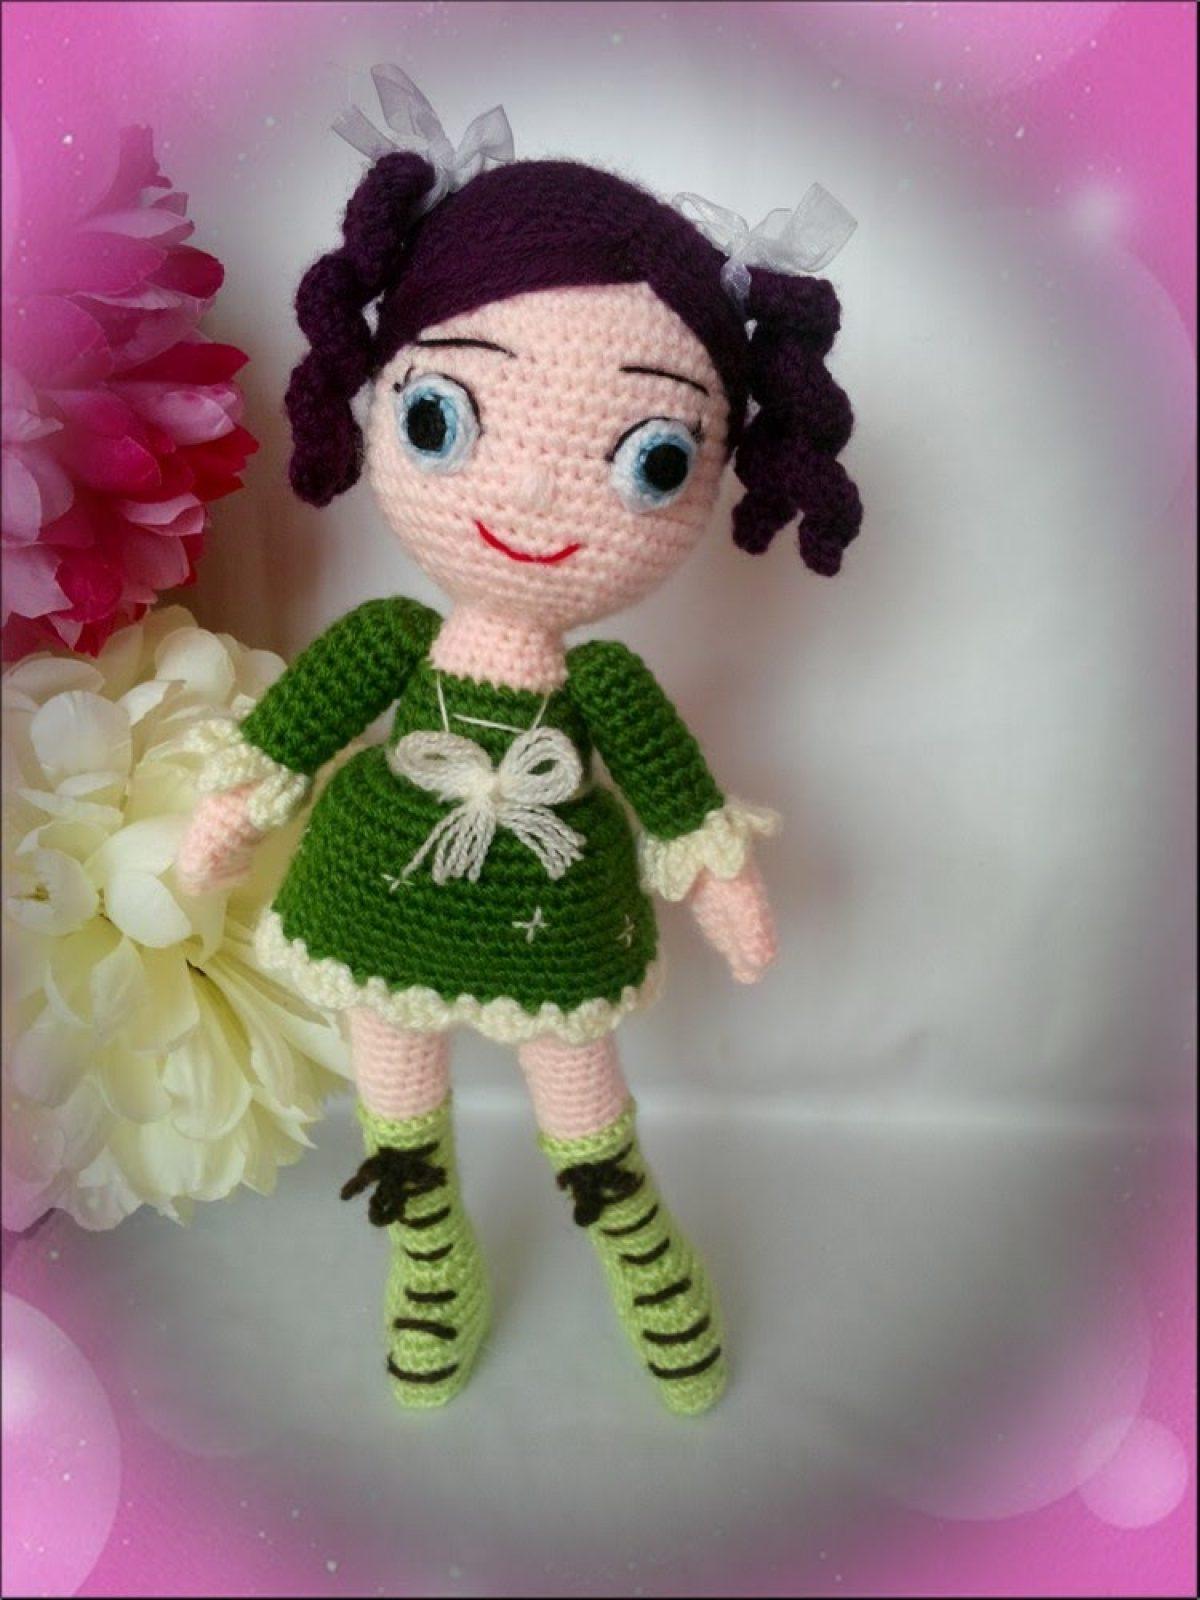 TonTon Doll and Tilda Bunny Free English Pattern | Crochet dolls ... | 1600x1200